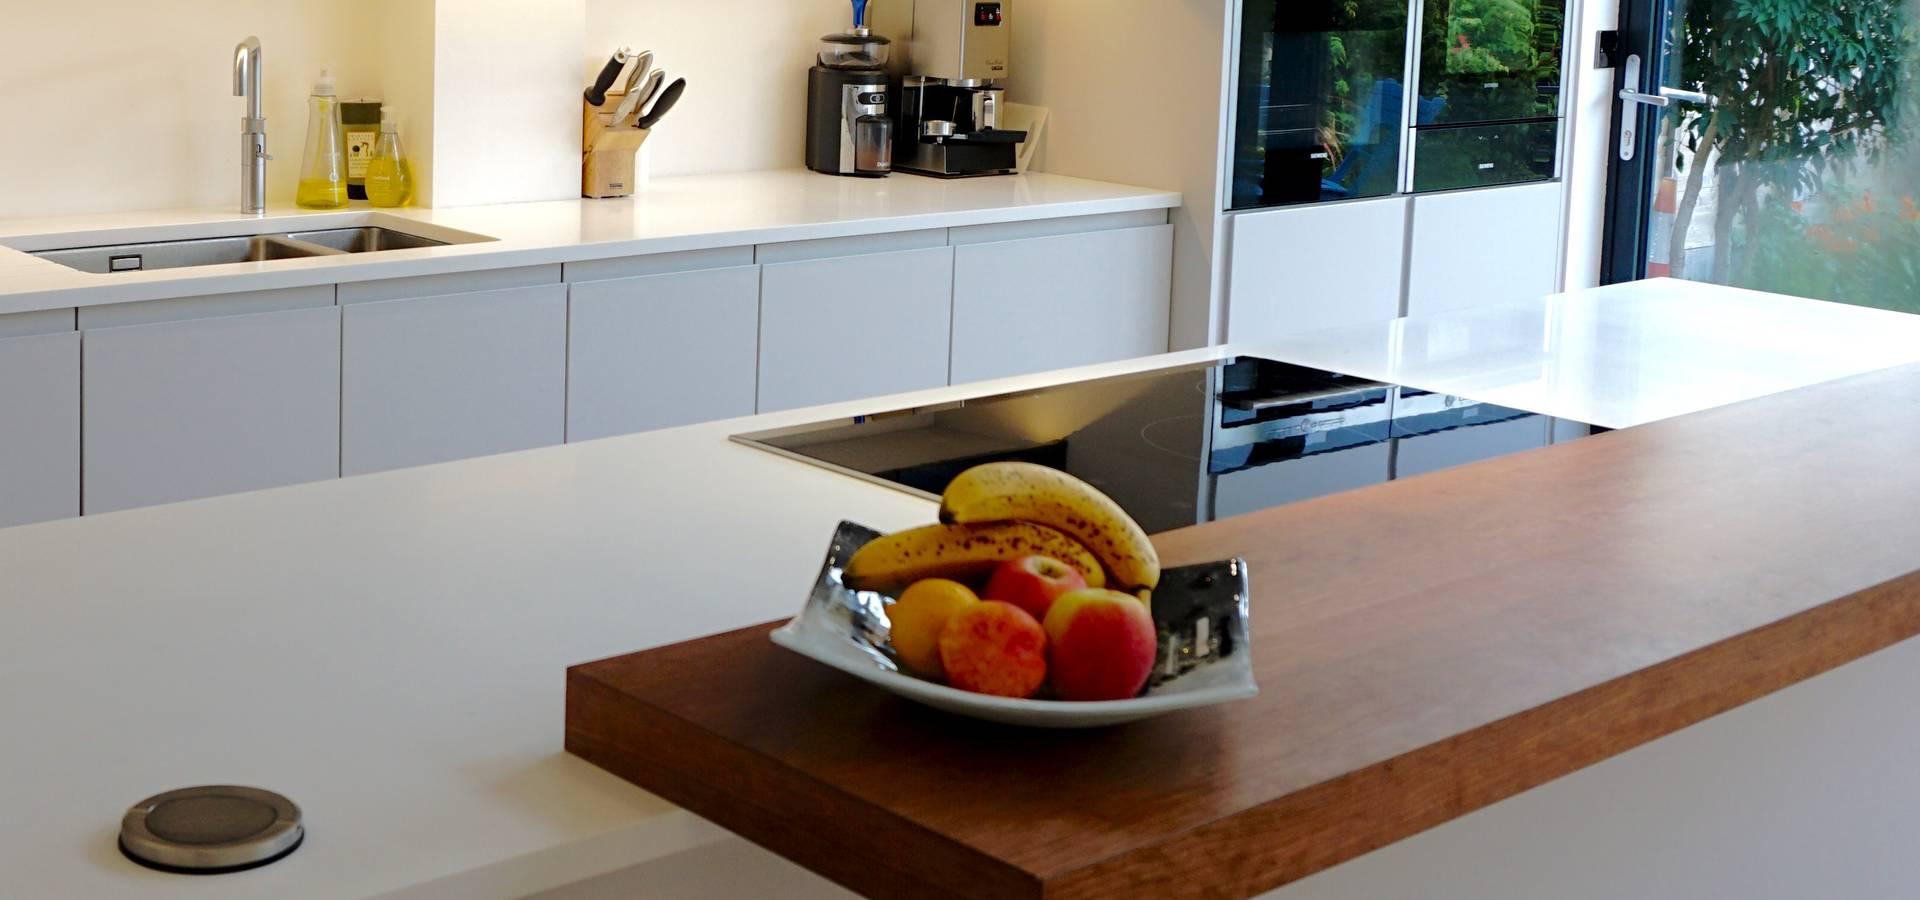 Morley Grove Kitchens